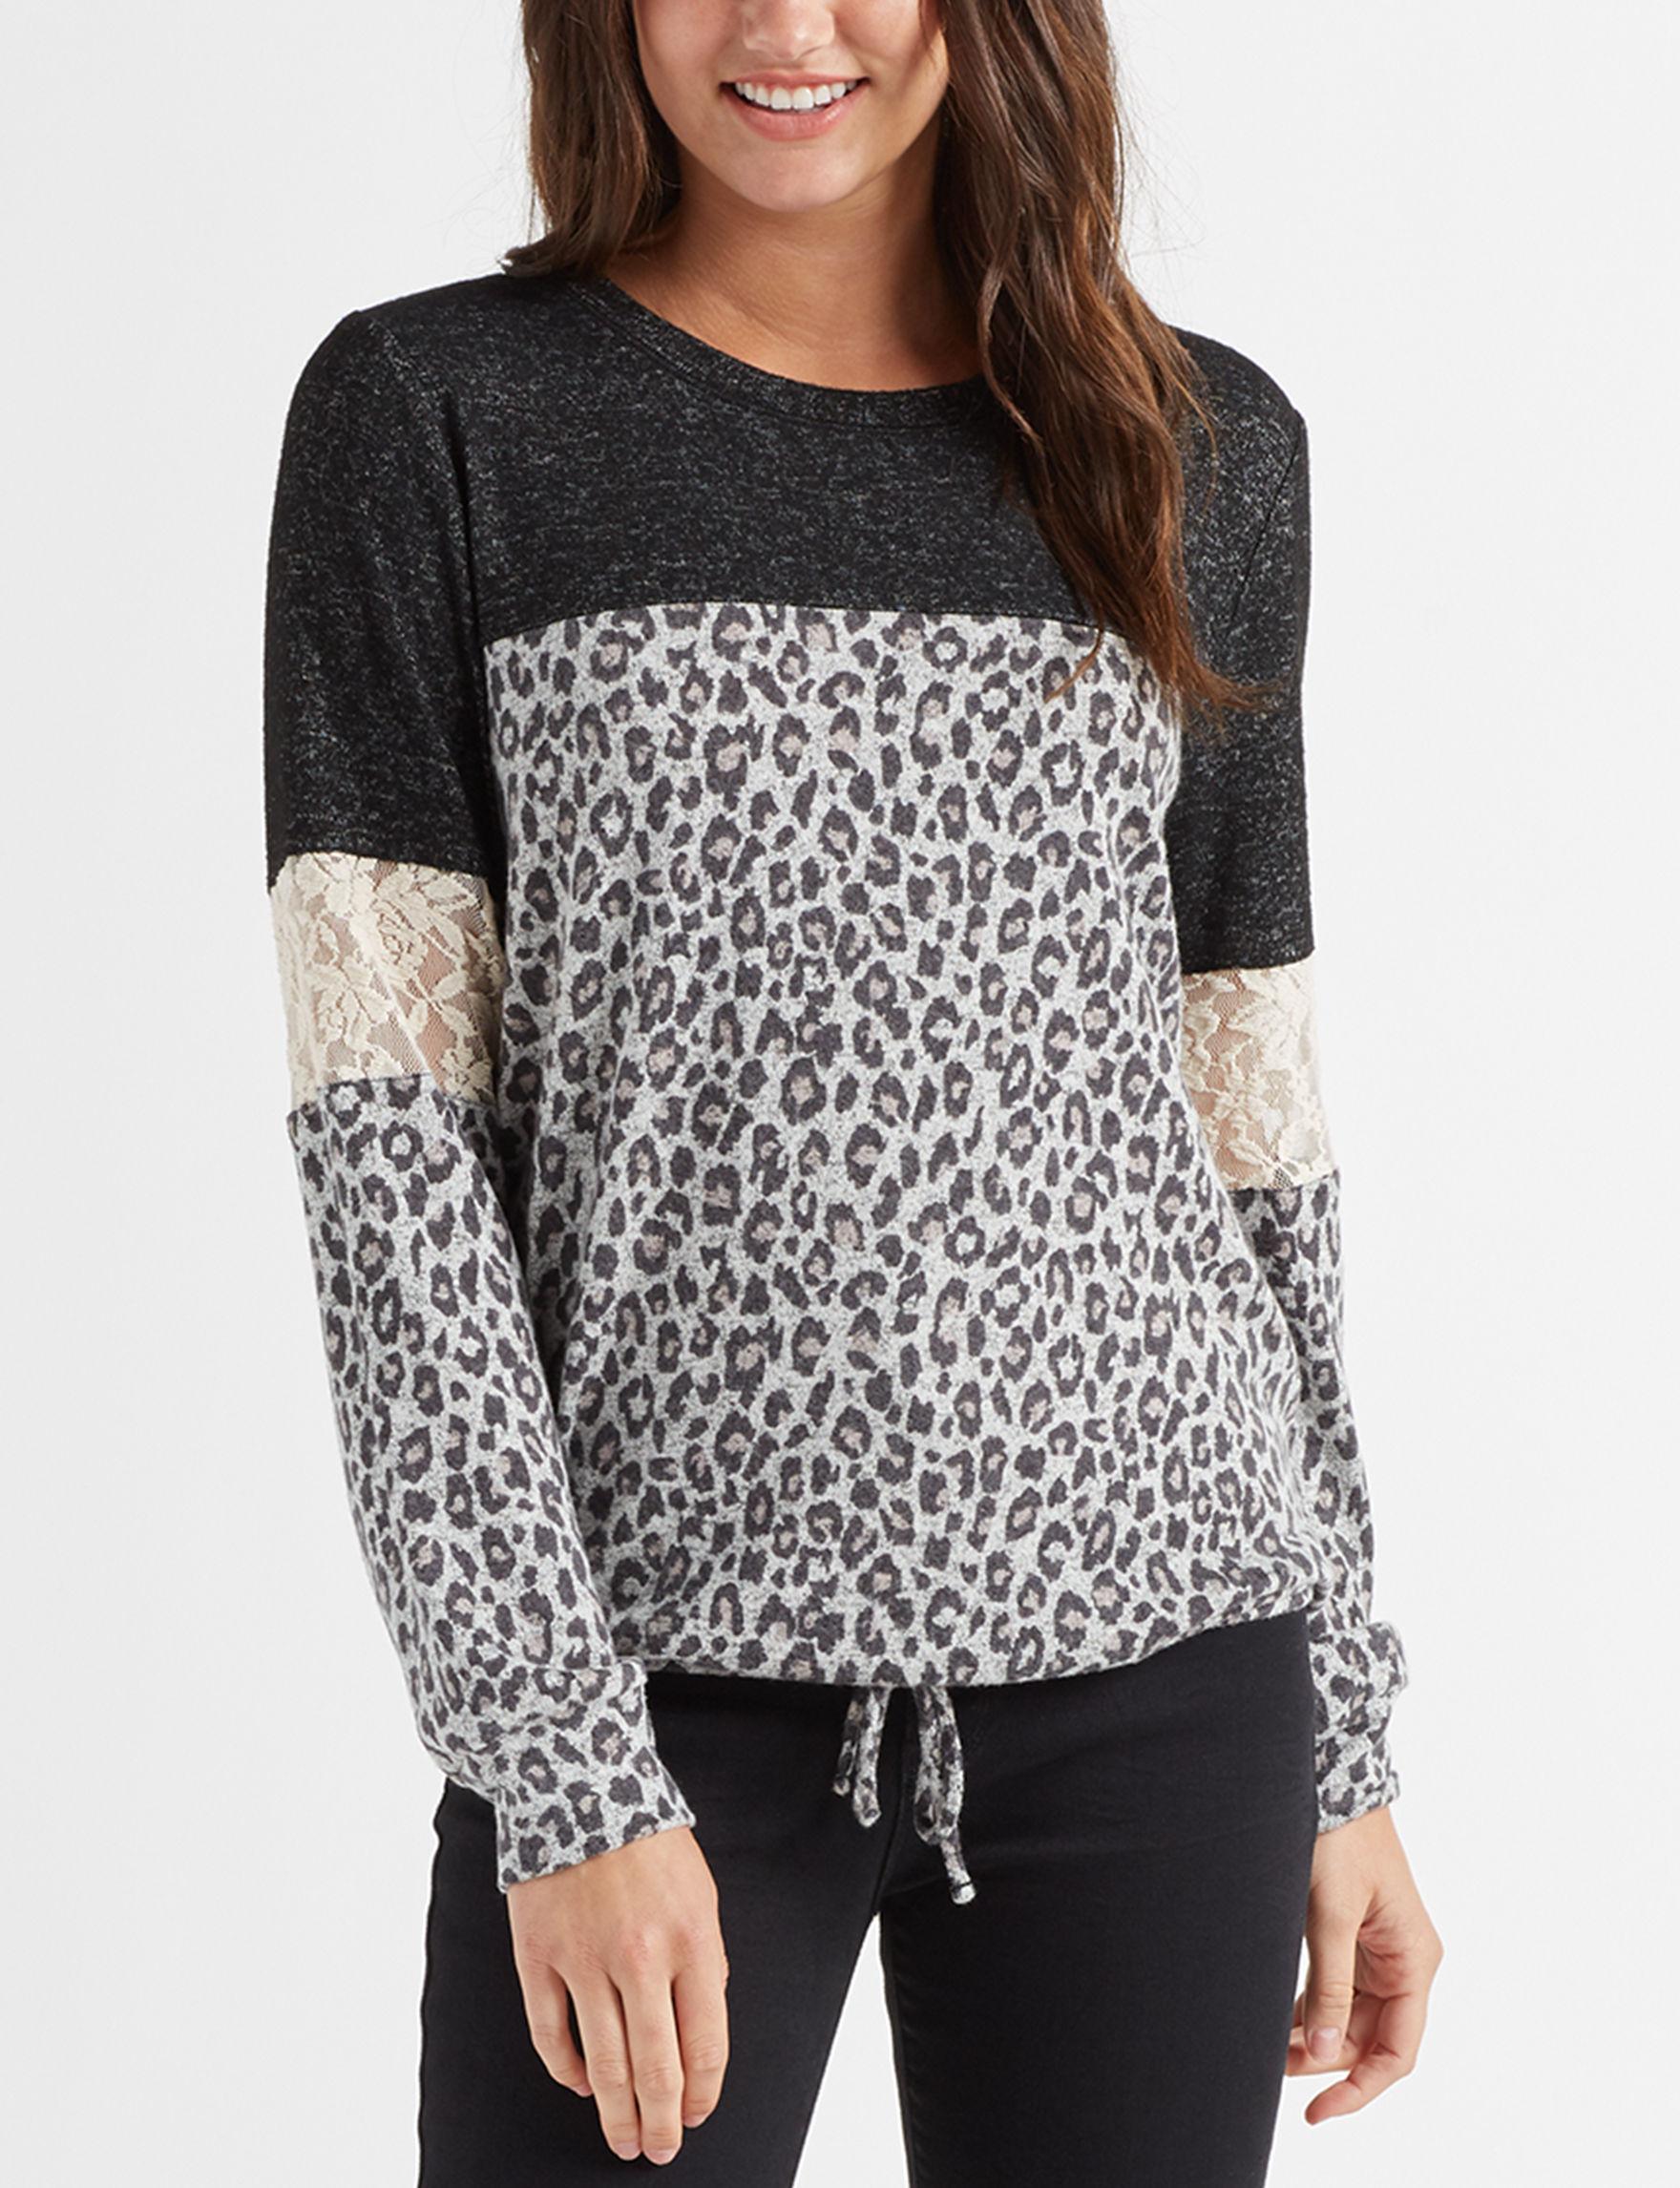 Jolt Black / Cheetah Shirts & Blouses